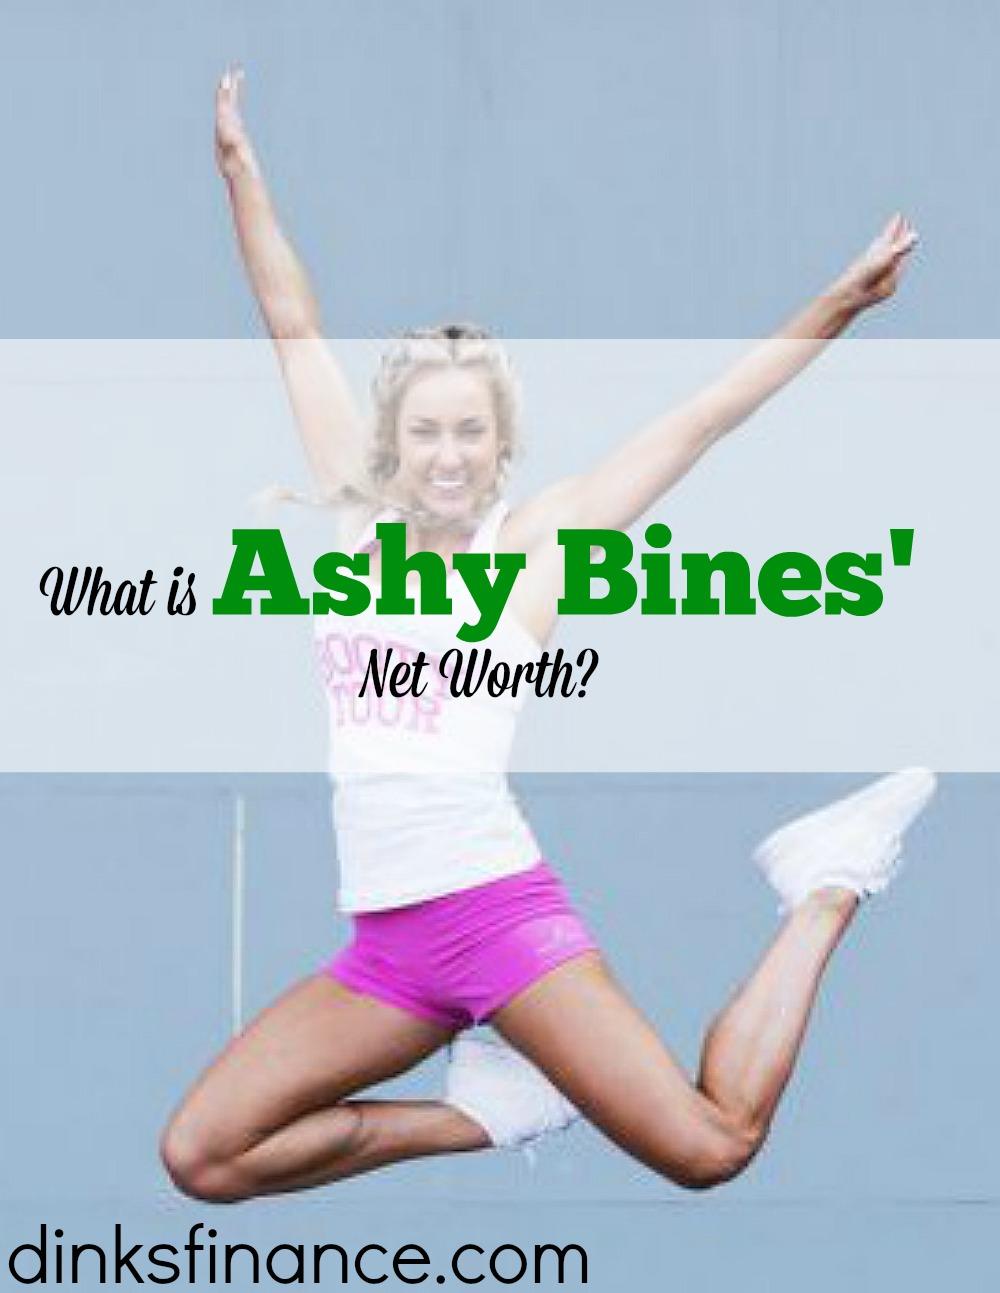 Australia's fitness guru, ashy bines net worth, story of ashy bines